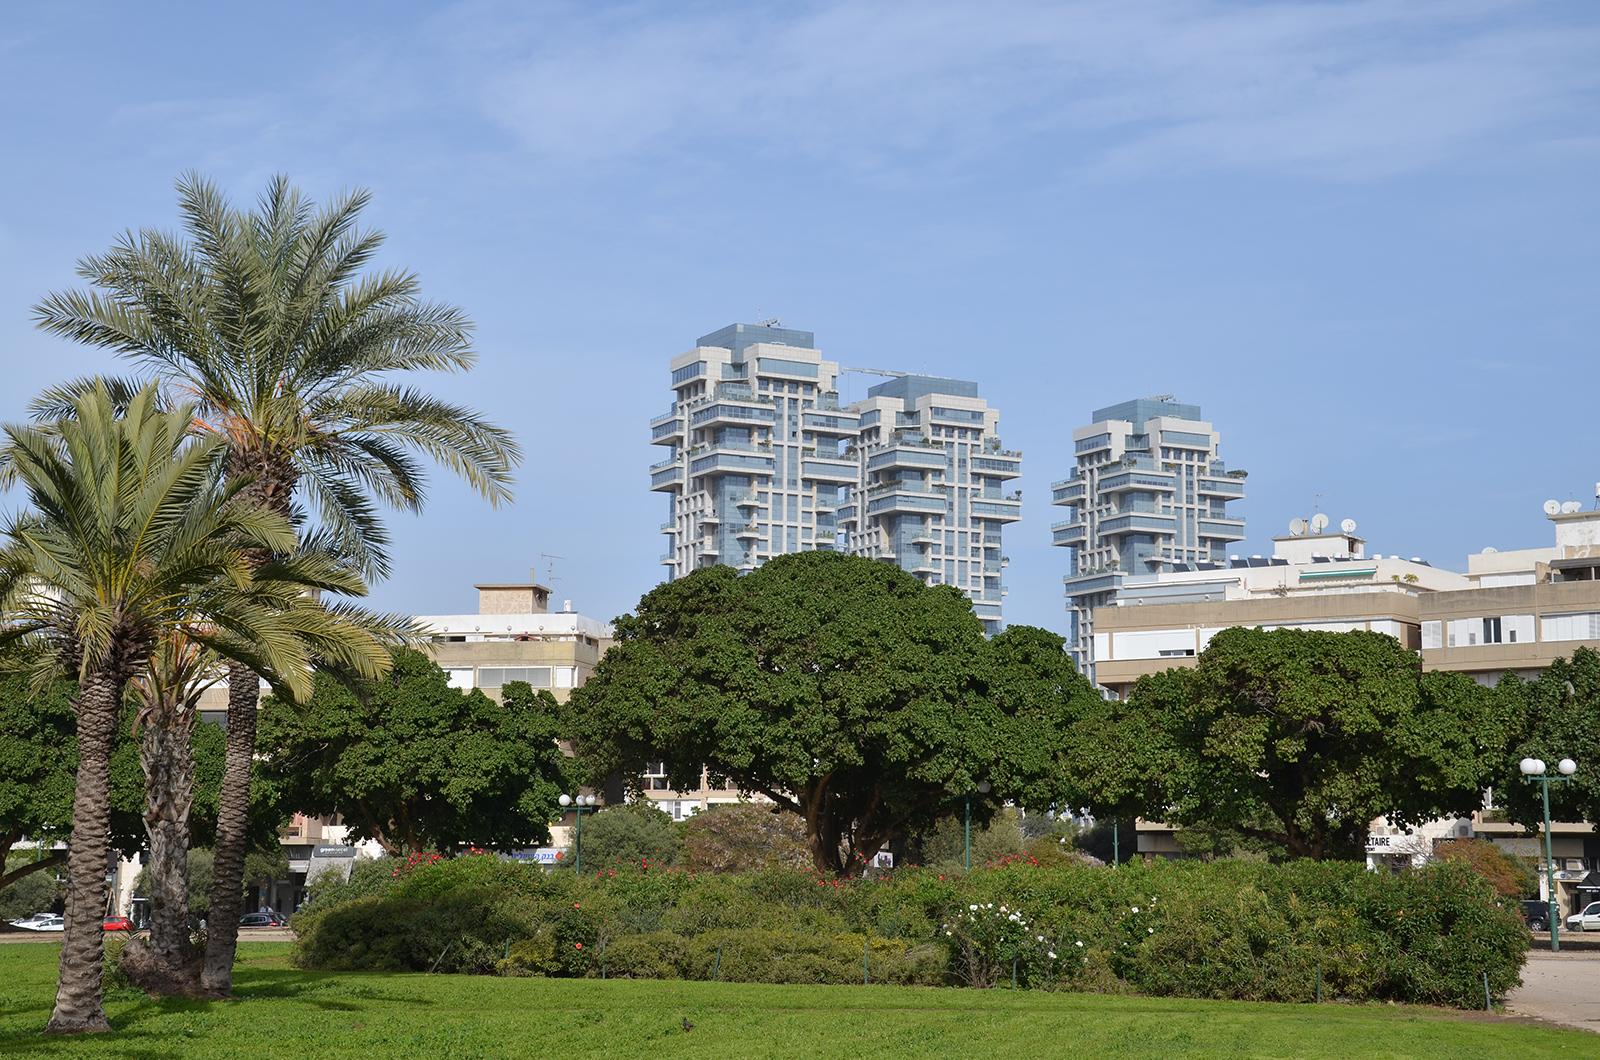 kikar ha medina, Tel-Aviv, Izrael